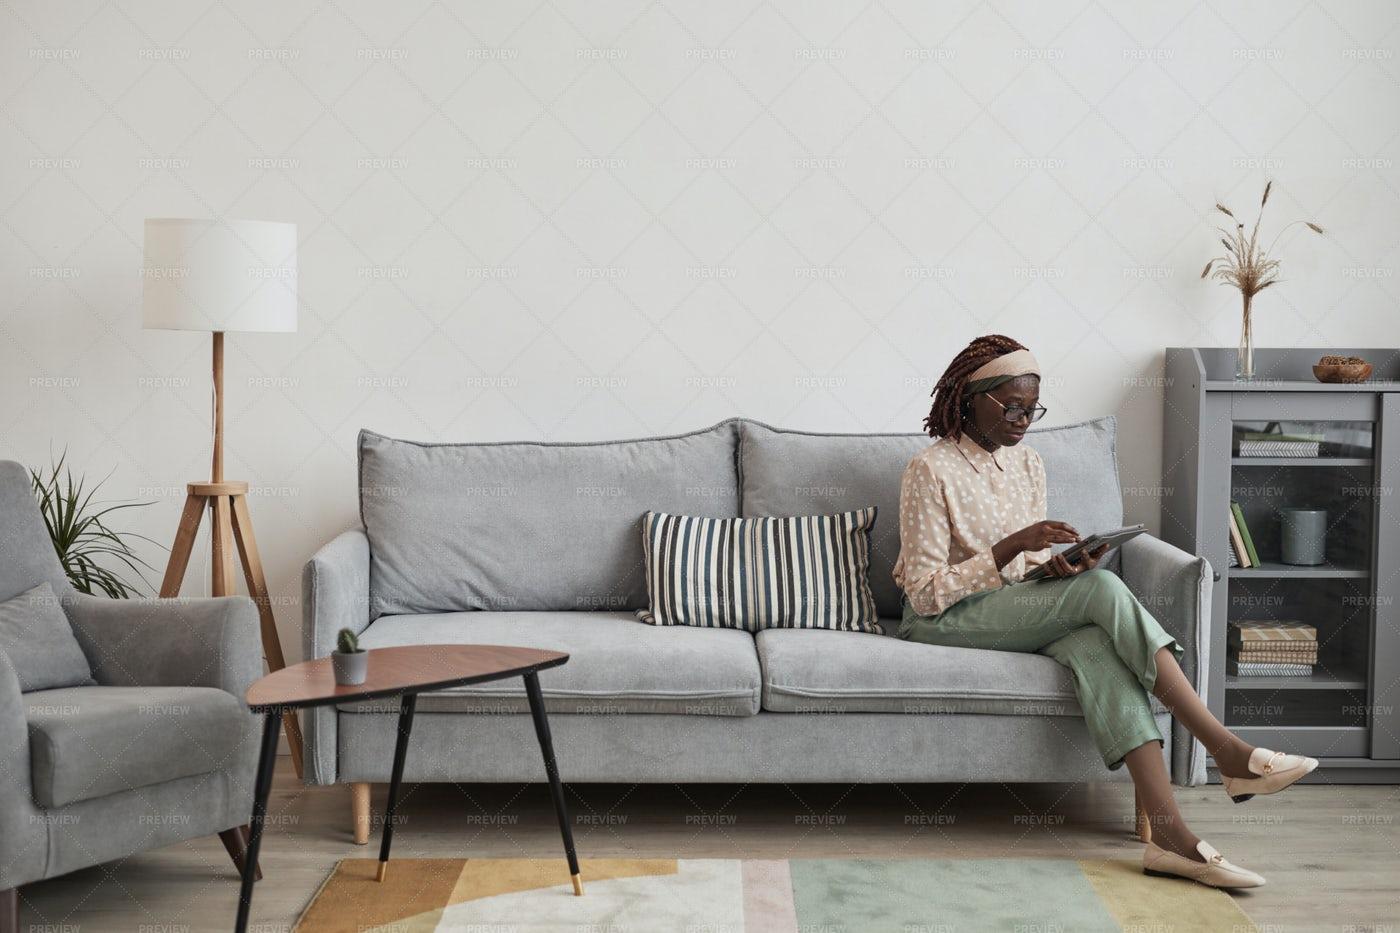 Woman At Home: Stock Photos